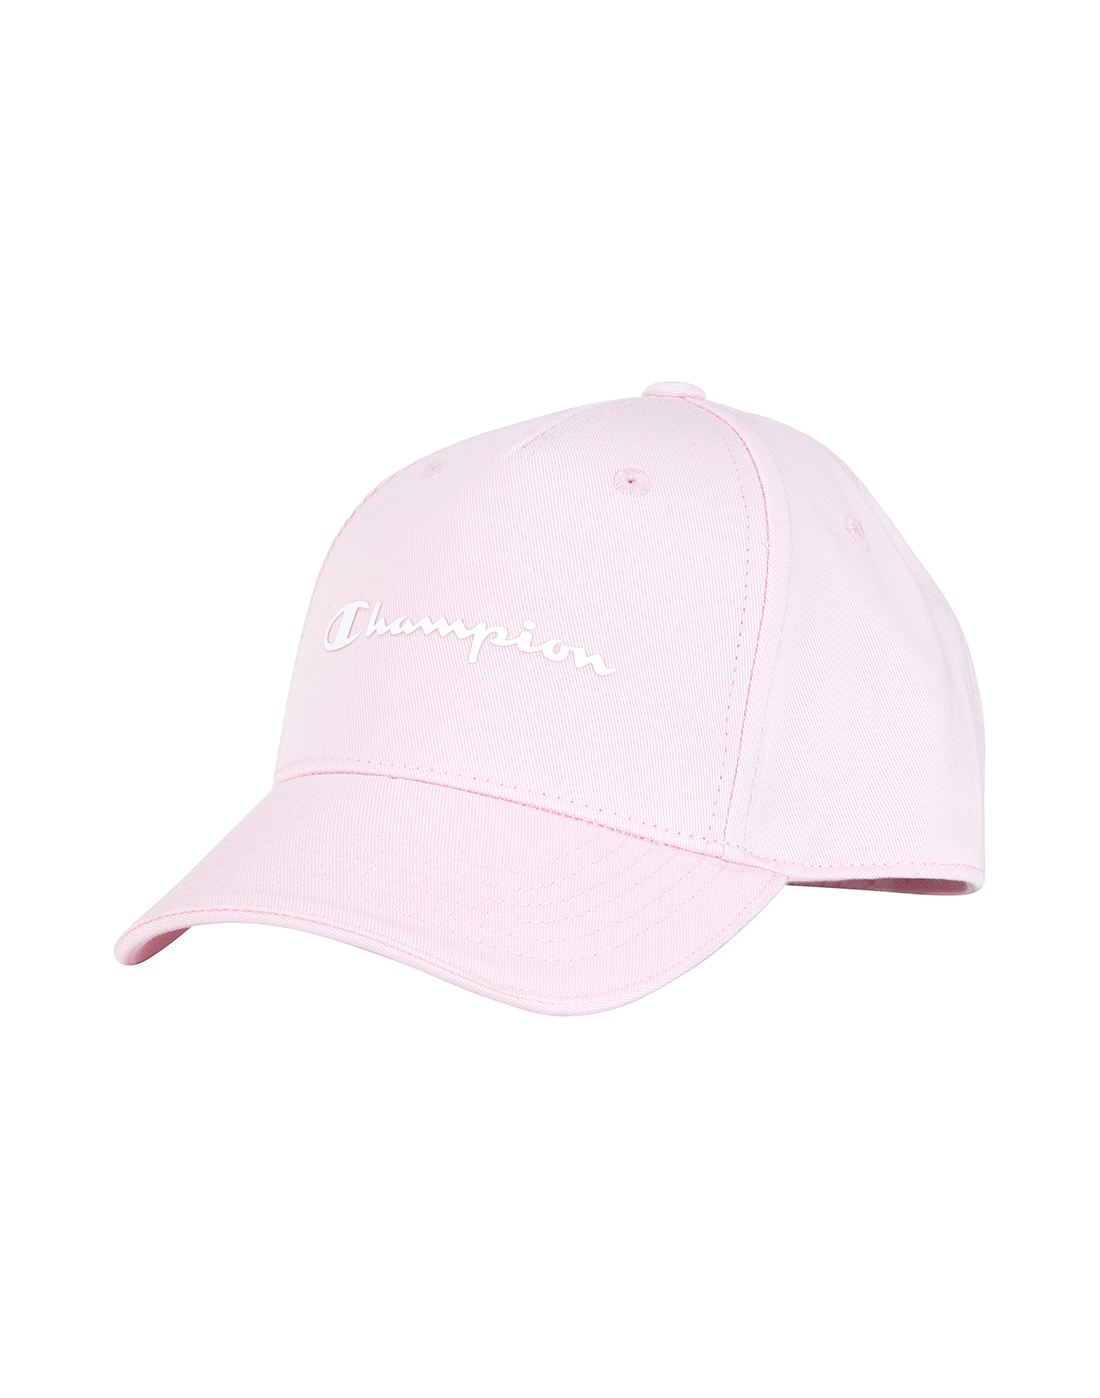 Champion Older Kids Logo Cap - Pink | new nike air max wave ...